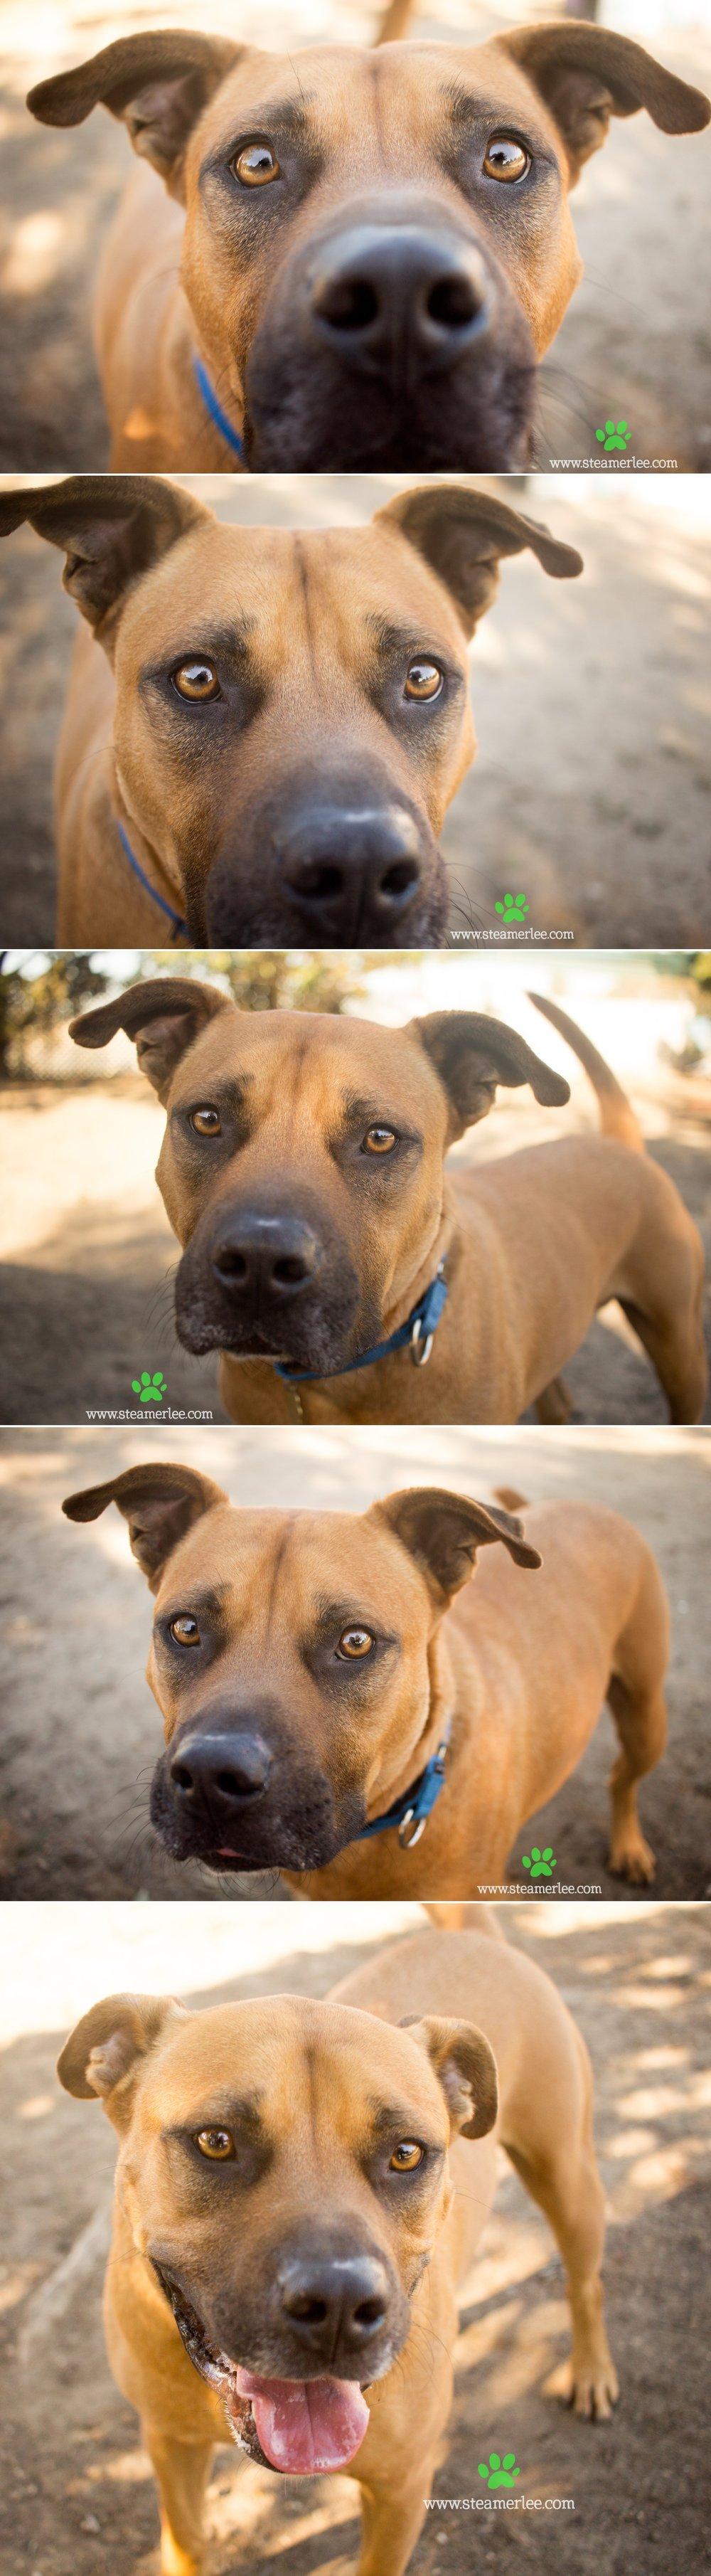 06 Steamer Lee Dog Photography - Seal Beach Animal Care Center.JPG